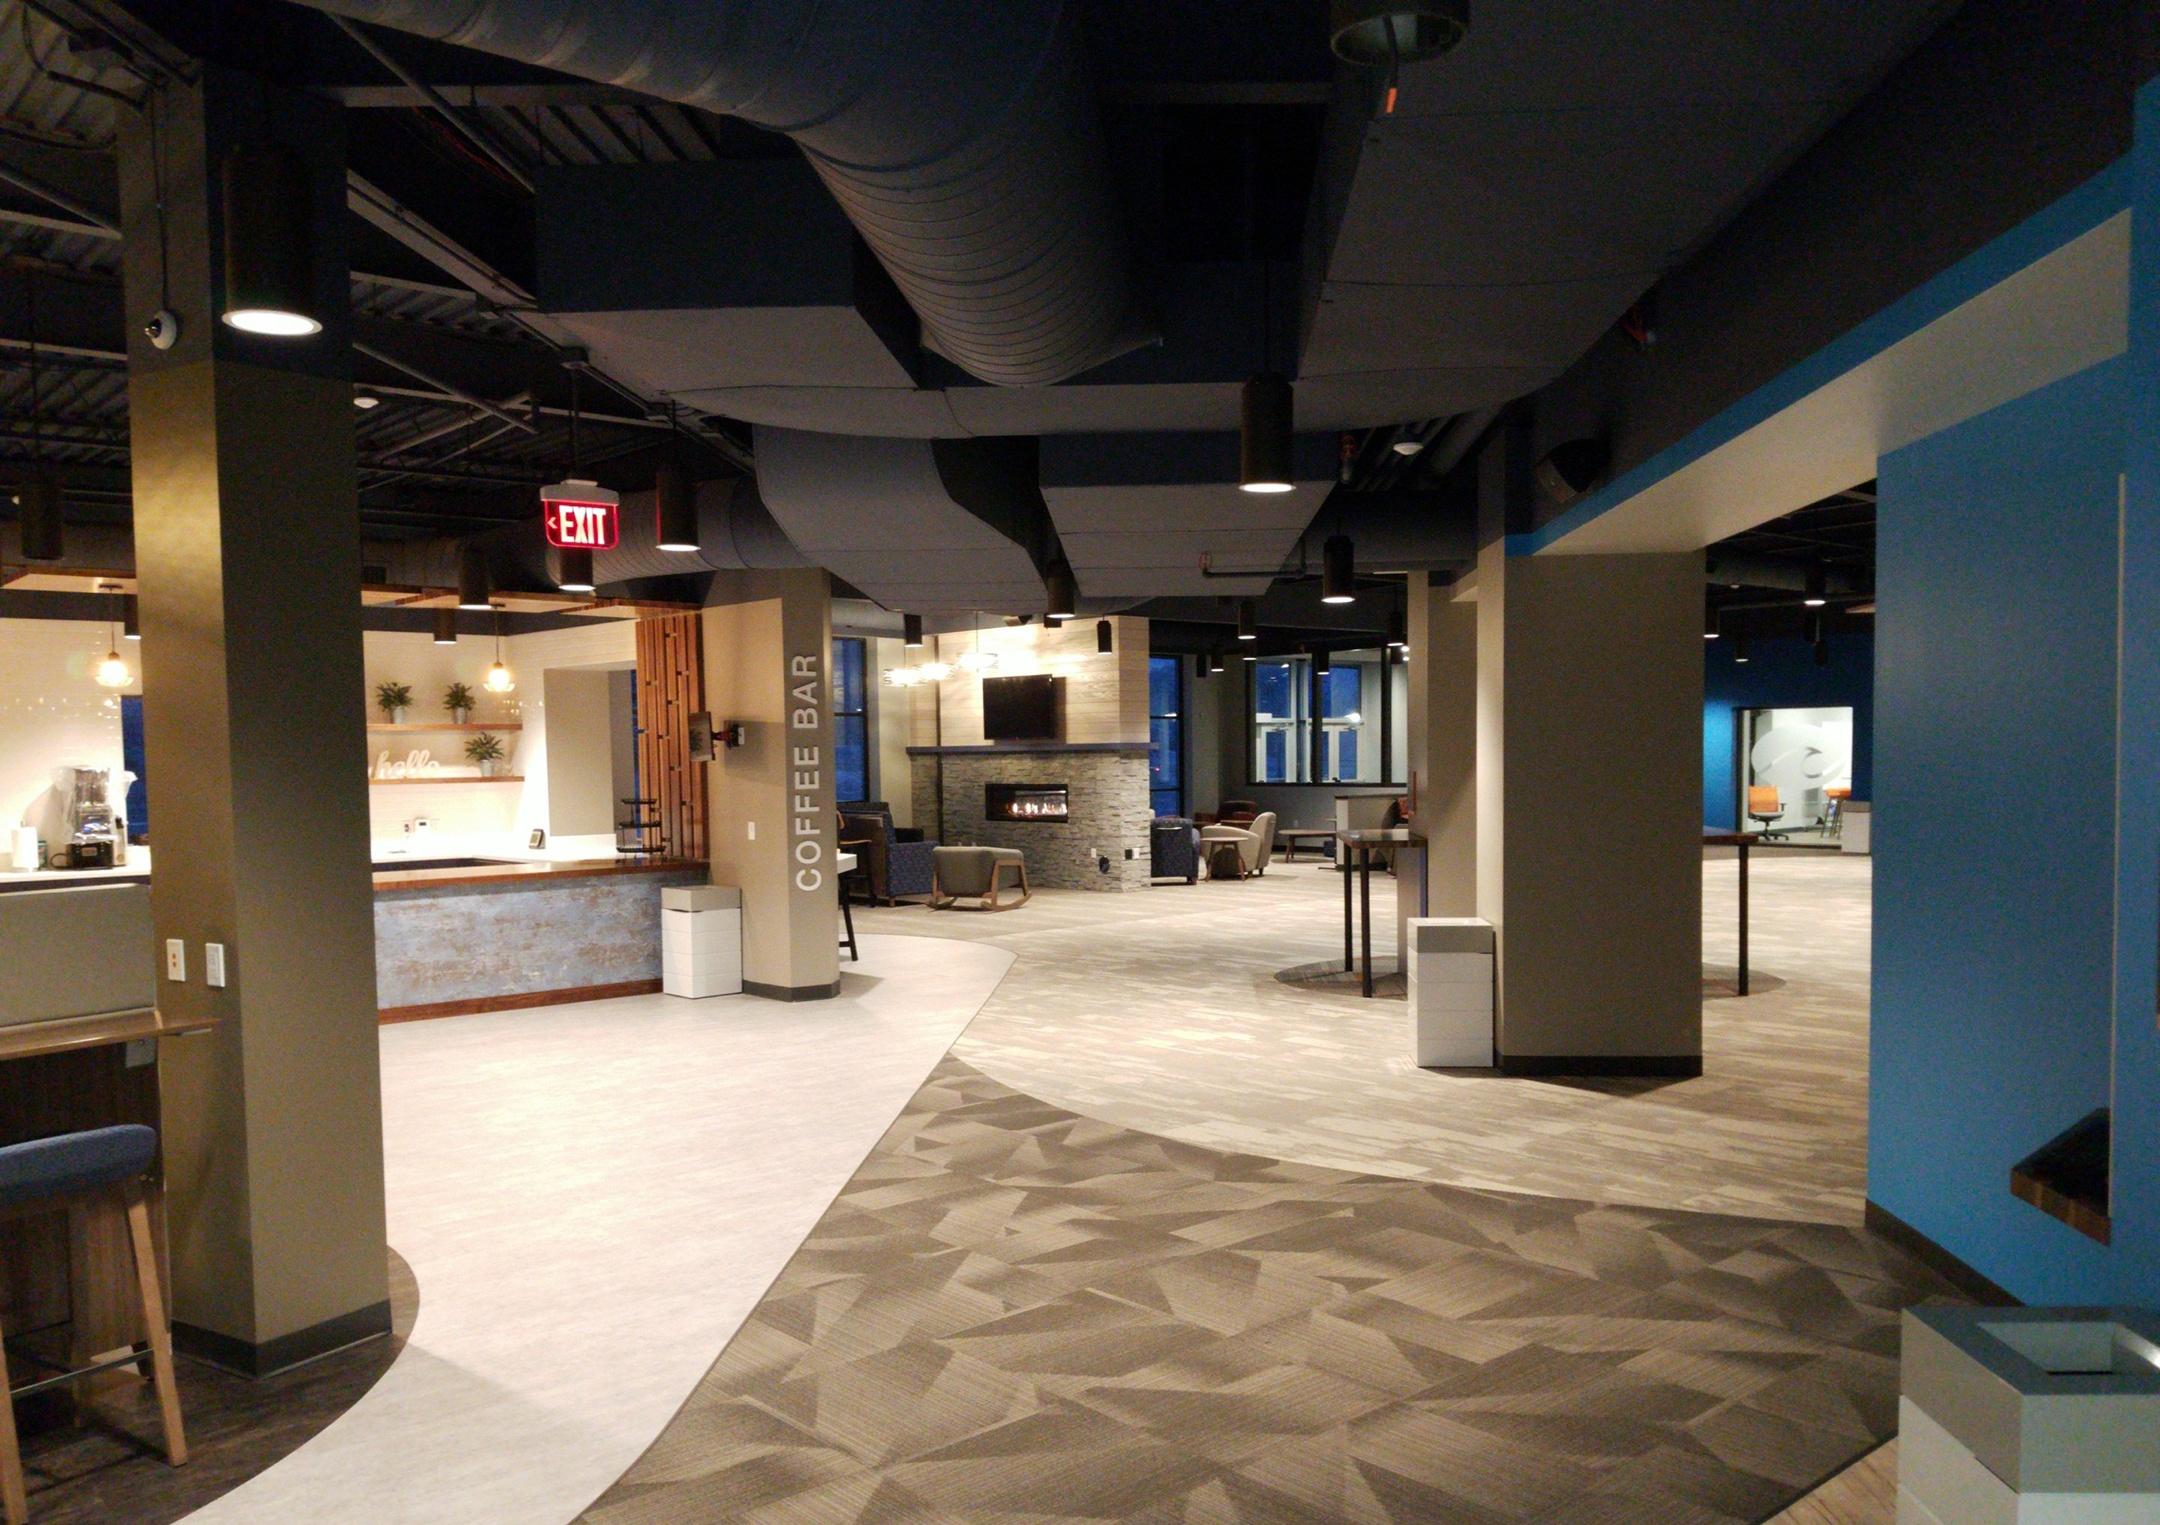 south-harbor-lobby-1.jpg